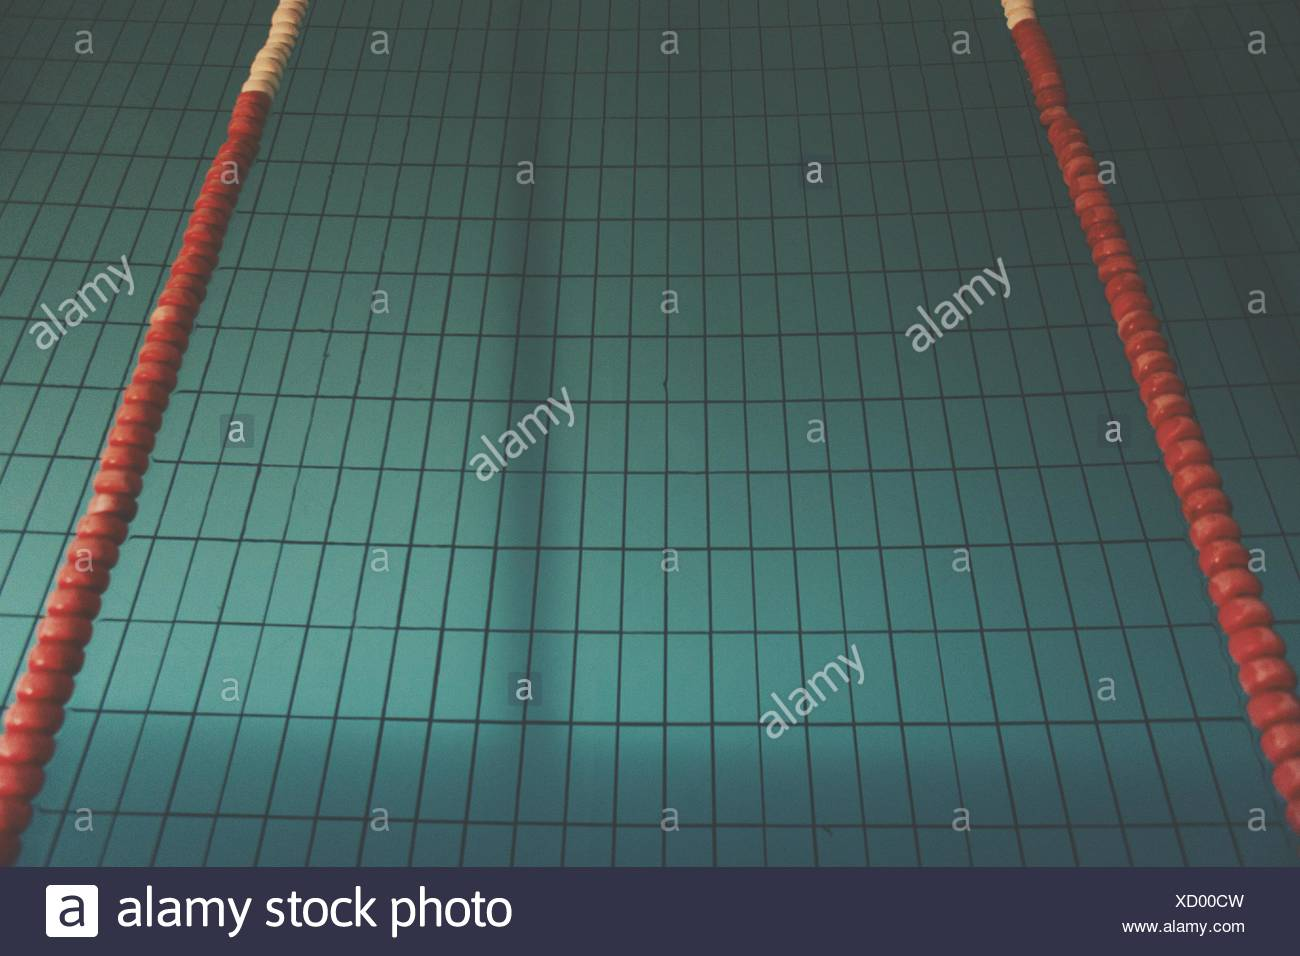 Tiled Bottom Of Swimming Pool Stock Photo: 283356777 - Alamy